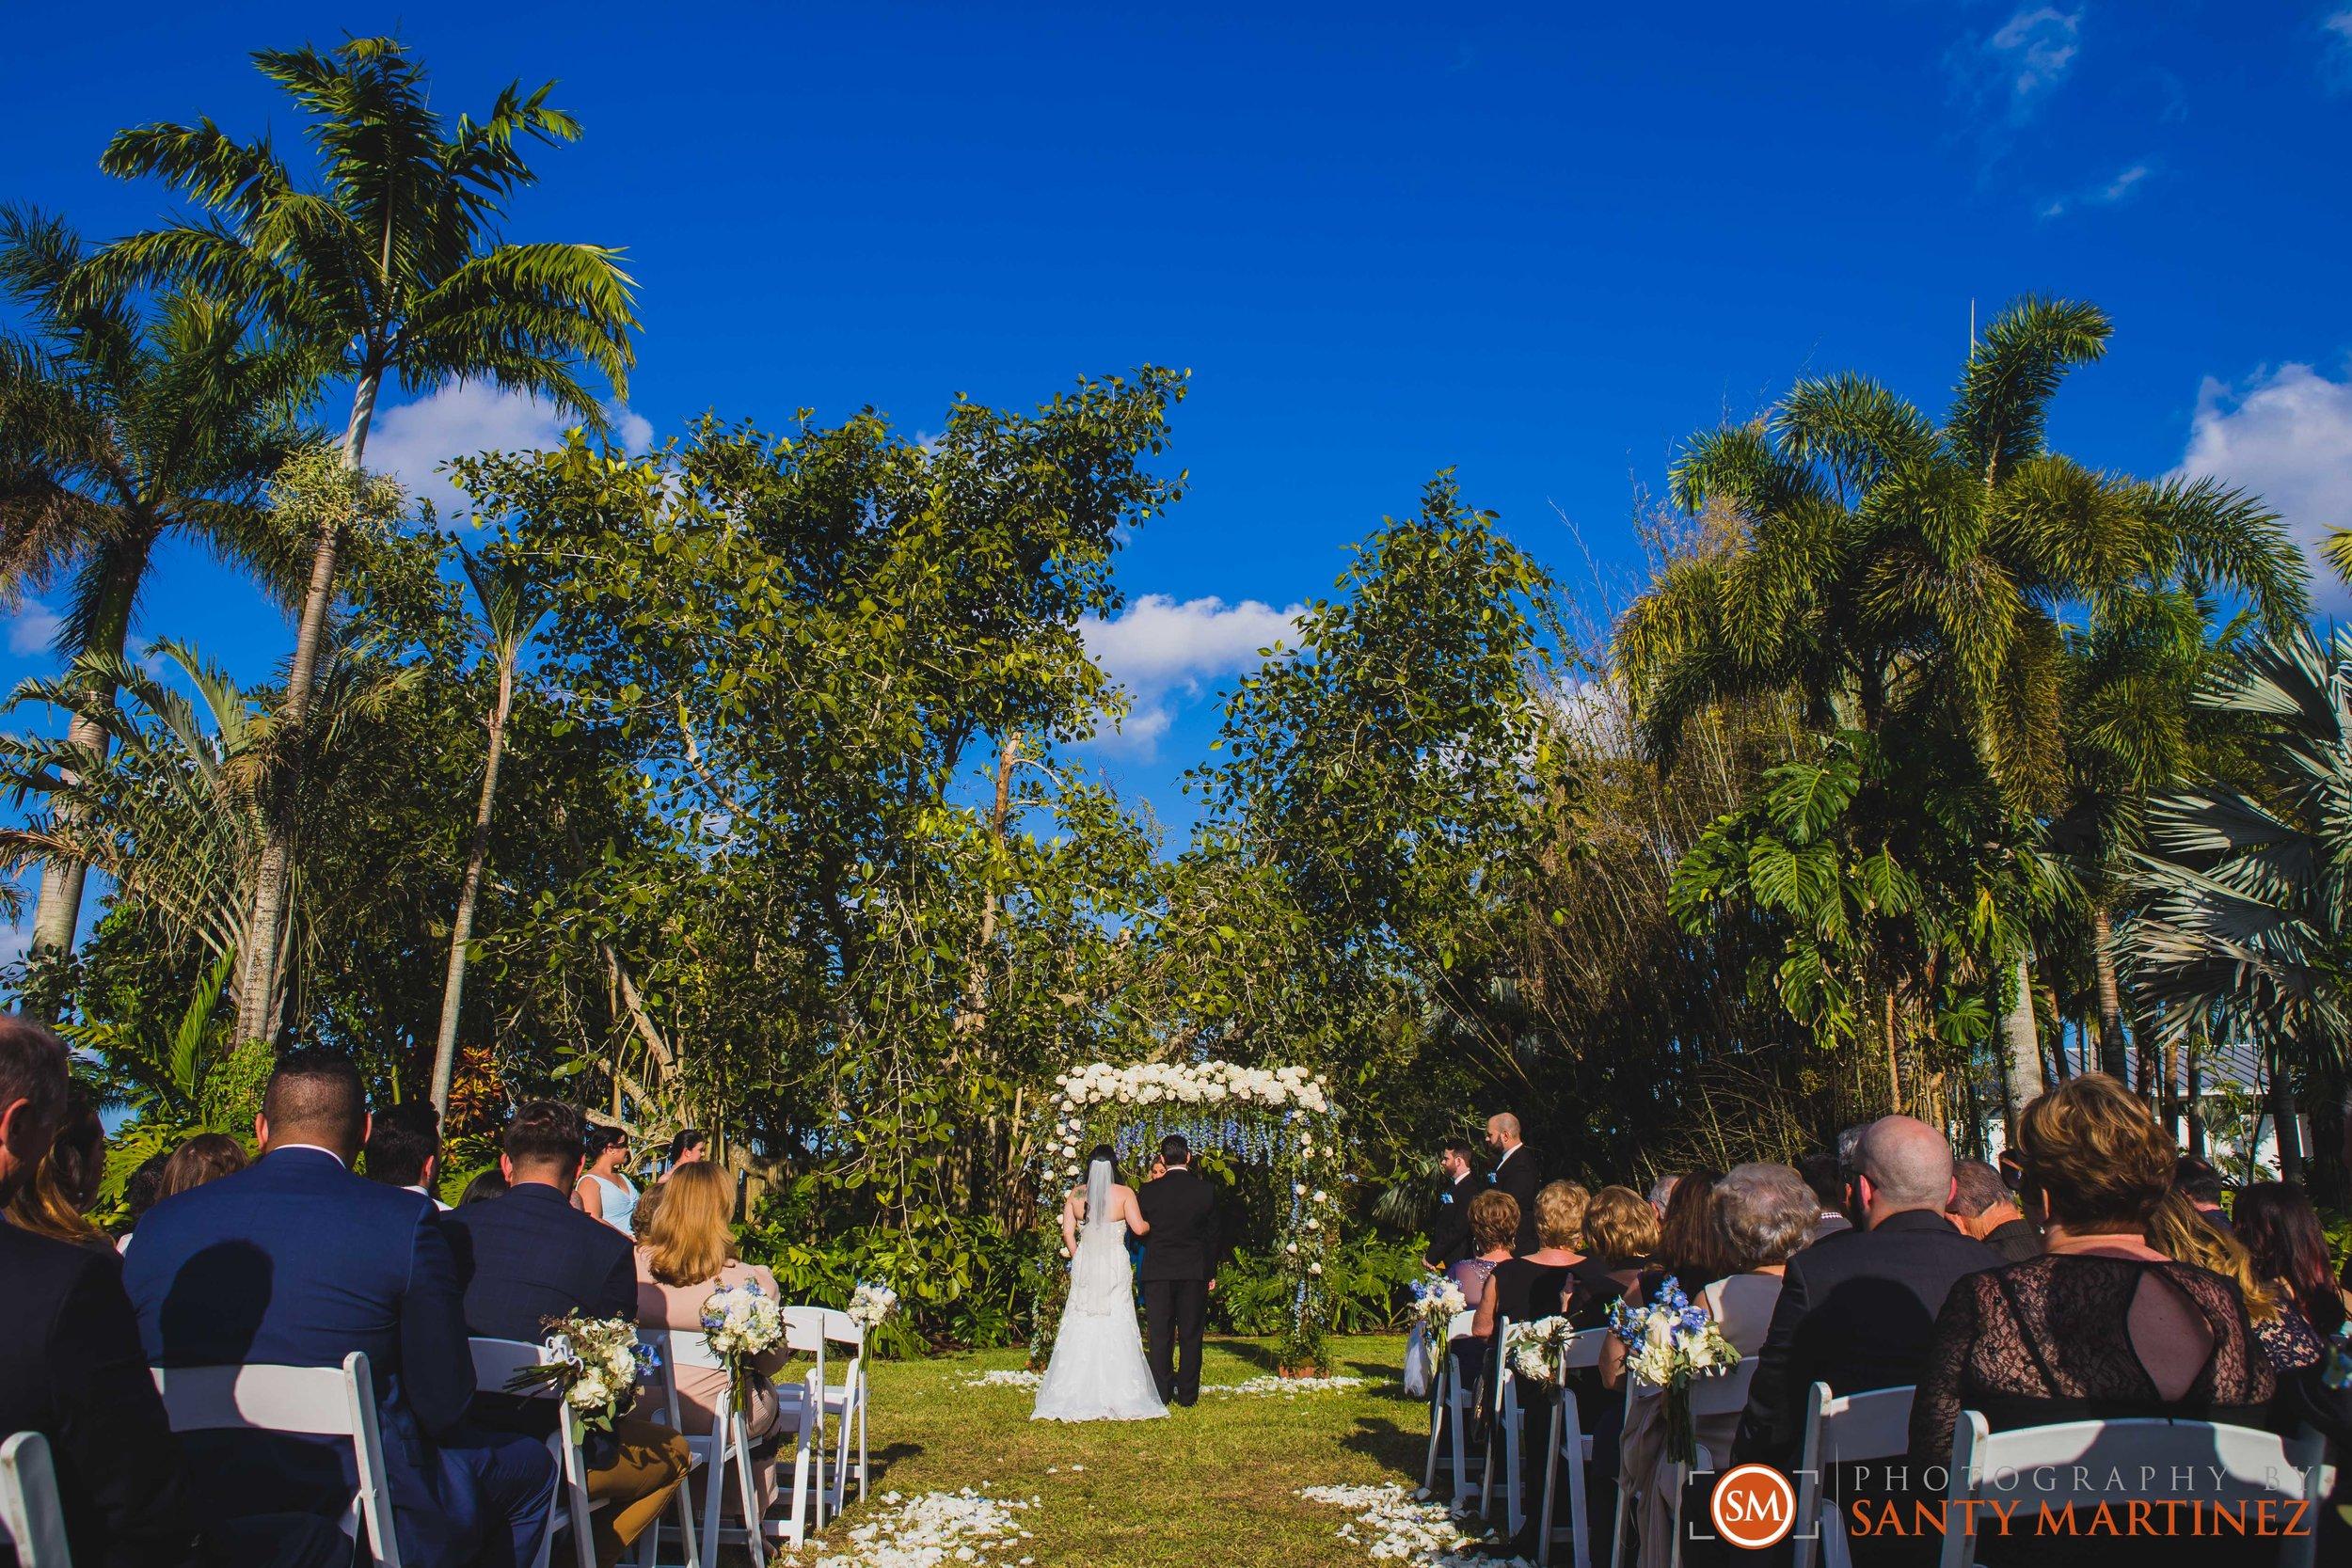 Wedding - Whimsical key West House - Photography by Santy Martinez-18.jpg